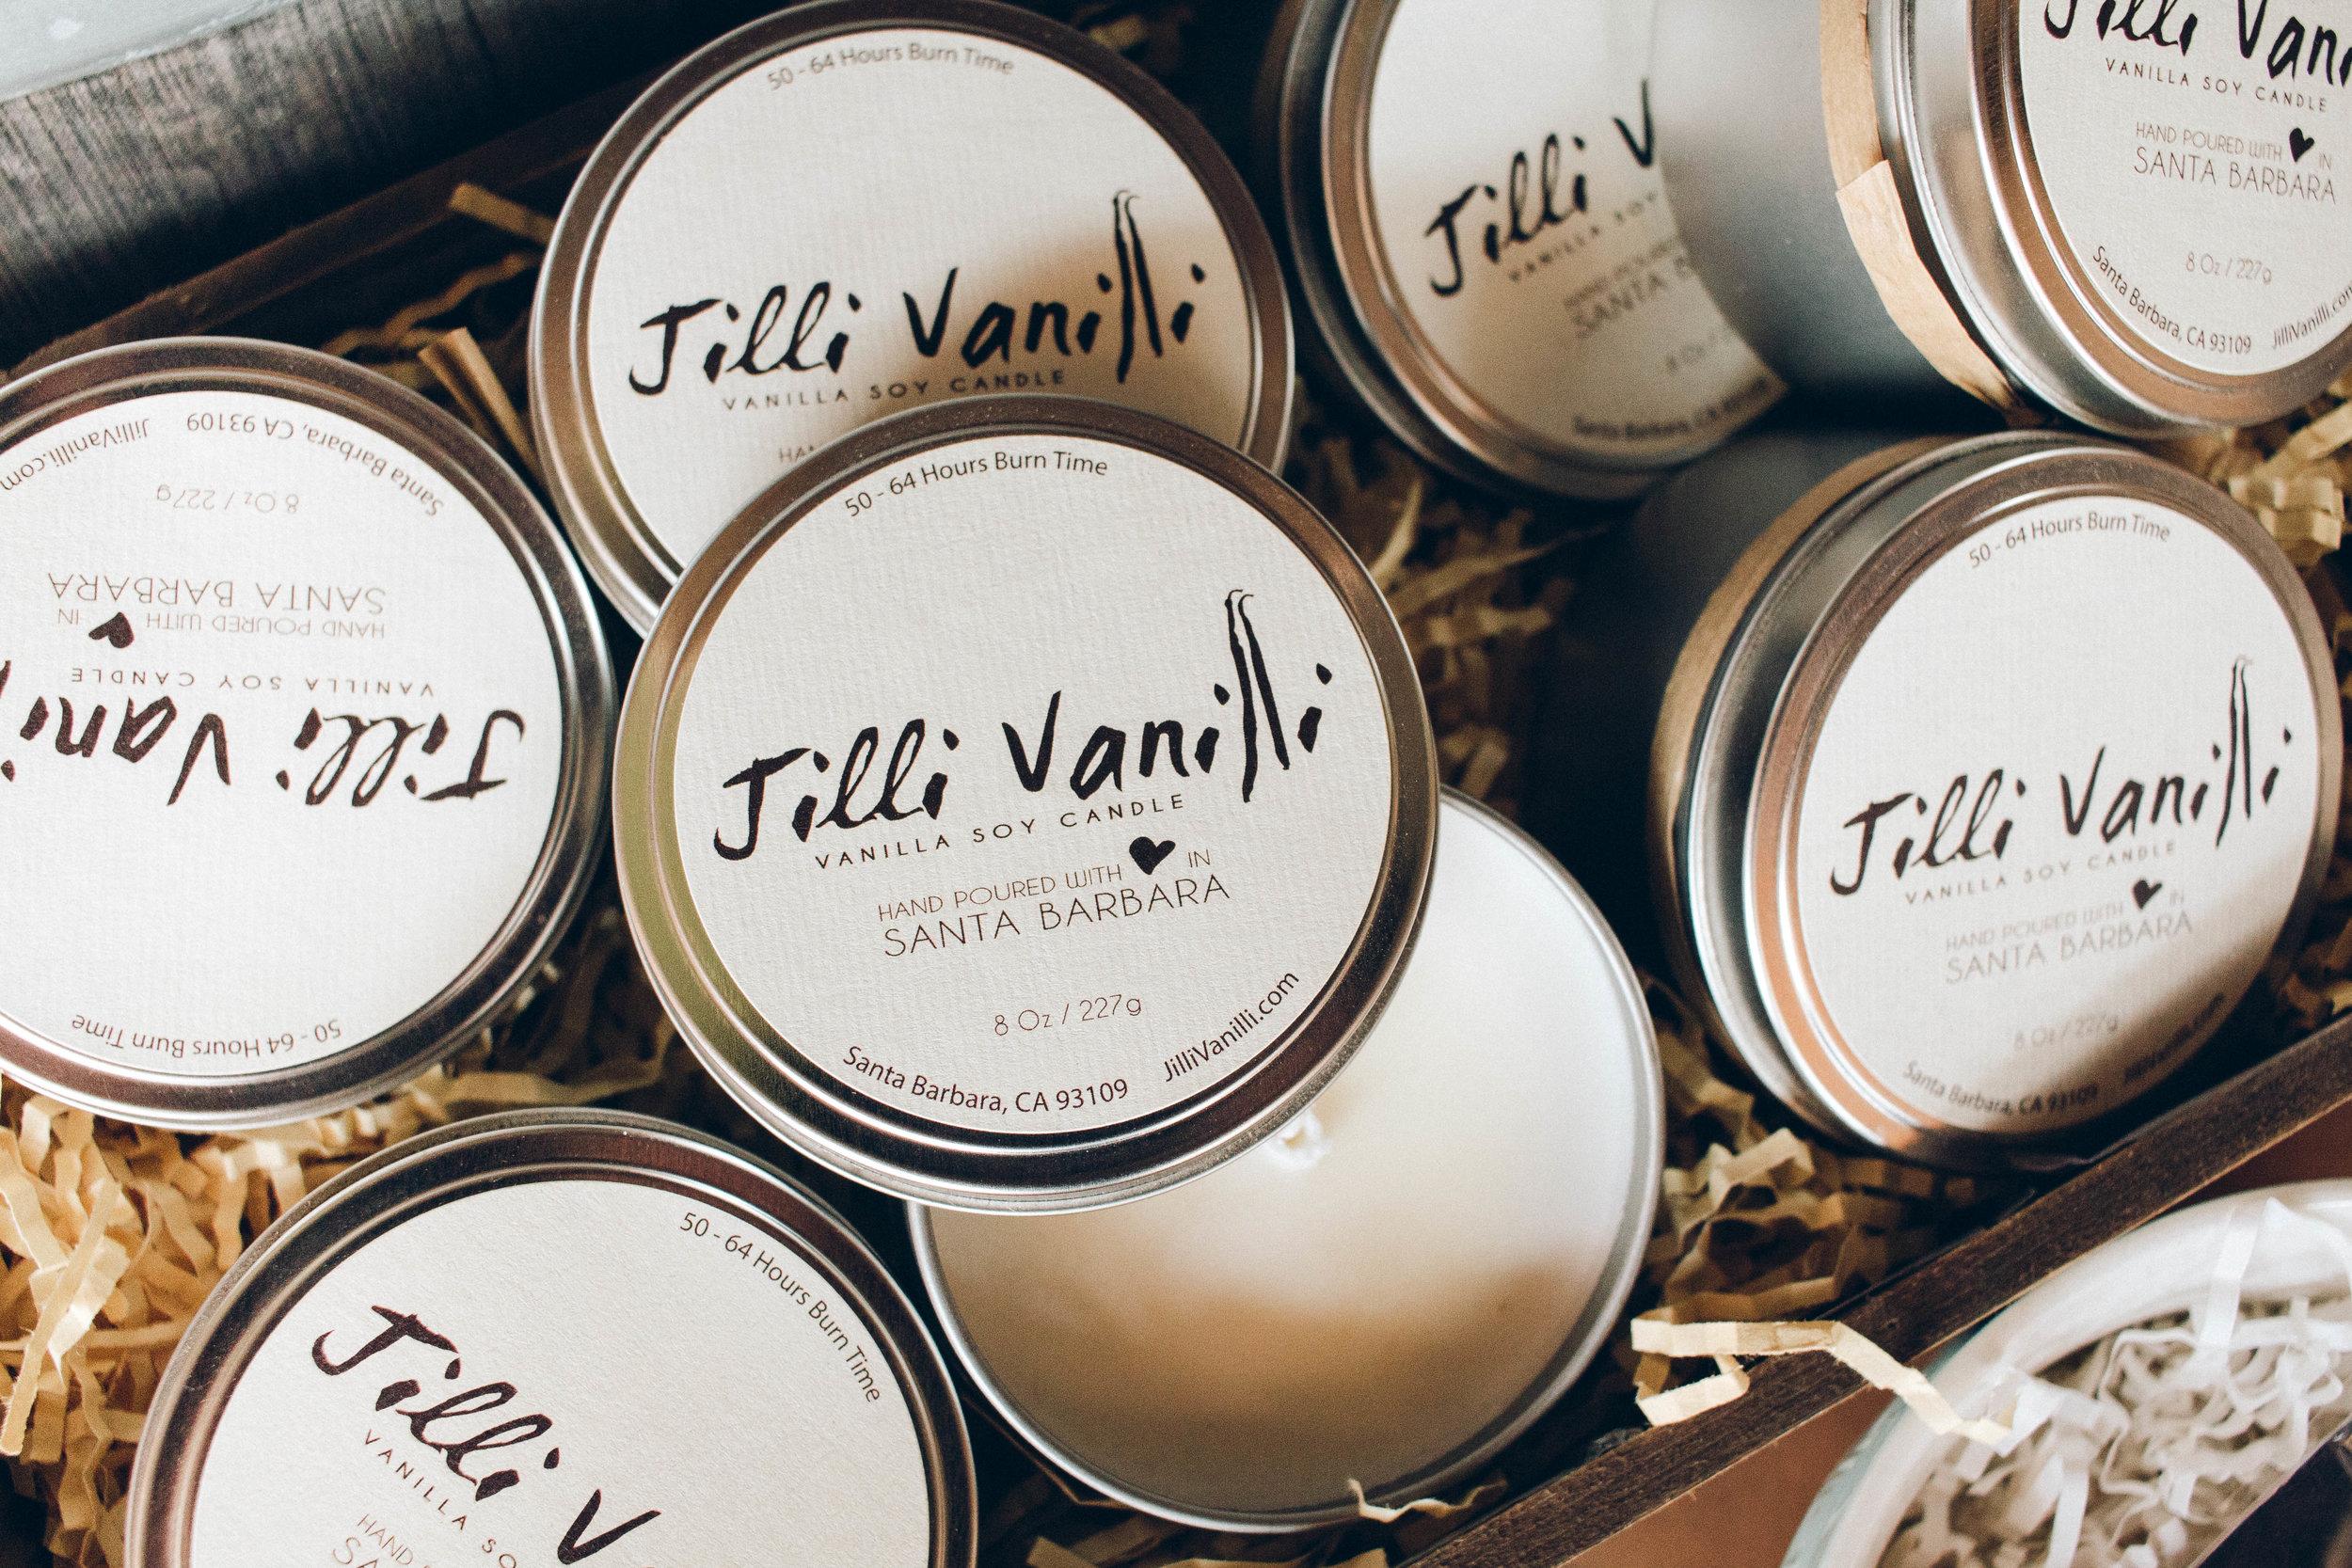 Jilli Vanilli Vanilla Soy Candle